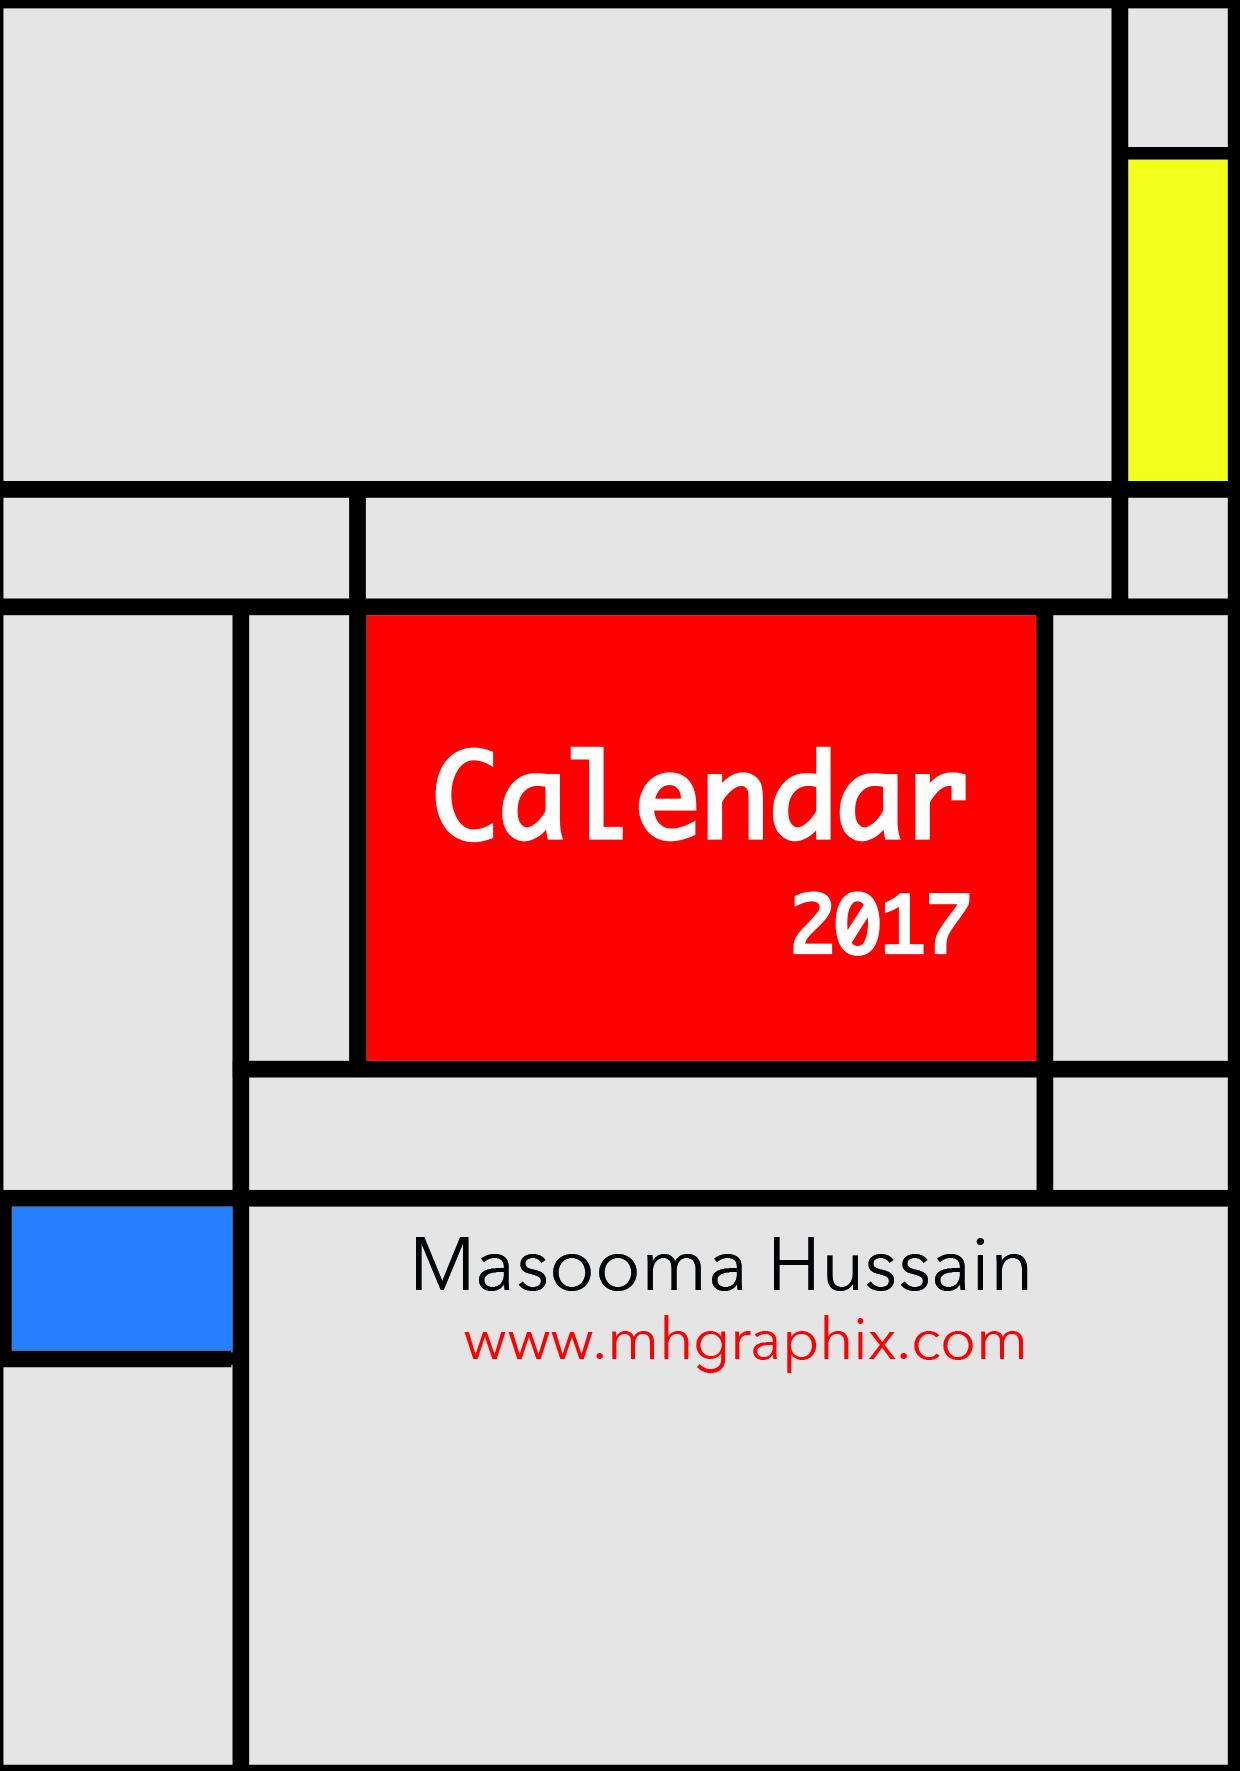 Calendar 2017 'De Stijl'